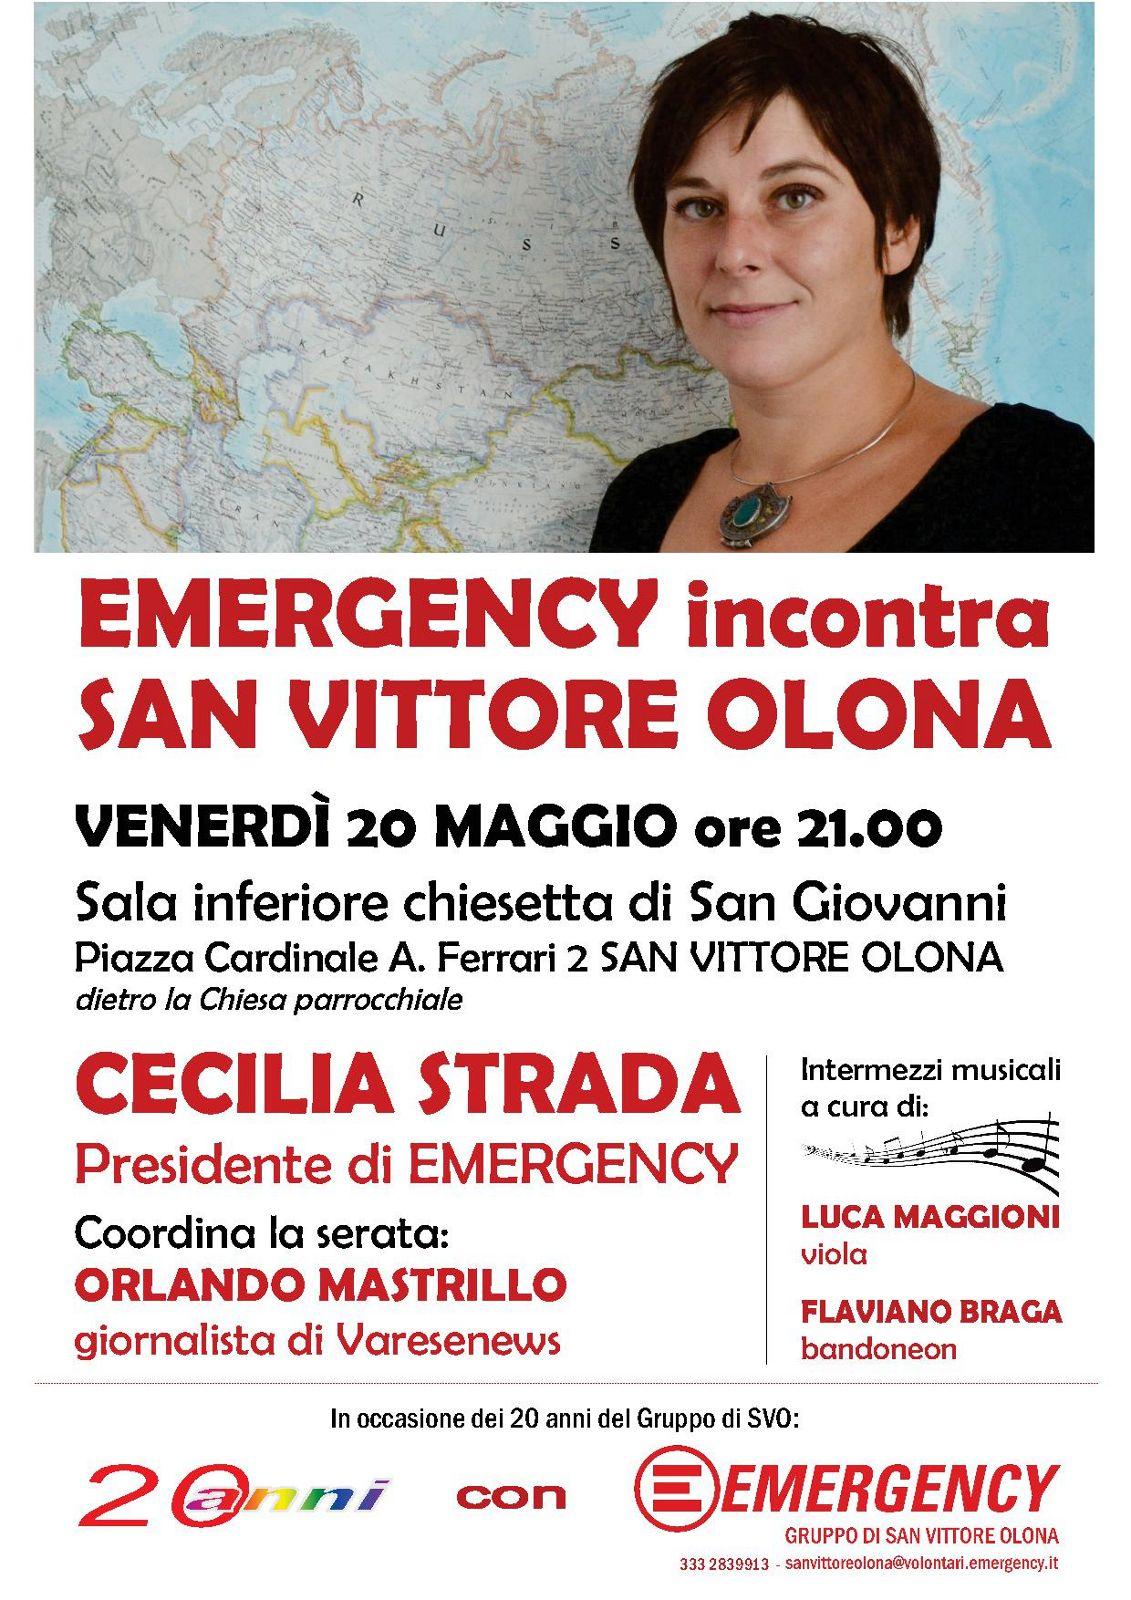 ventennale _per_emergency